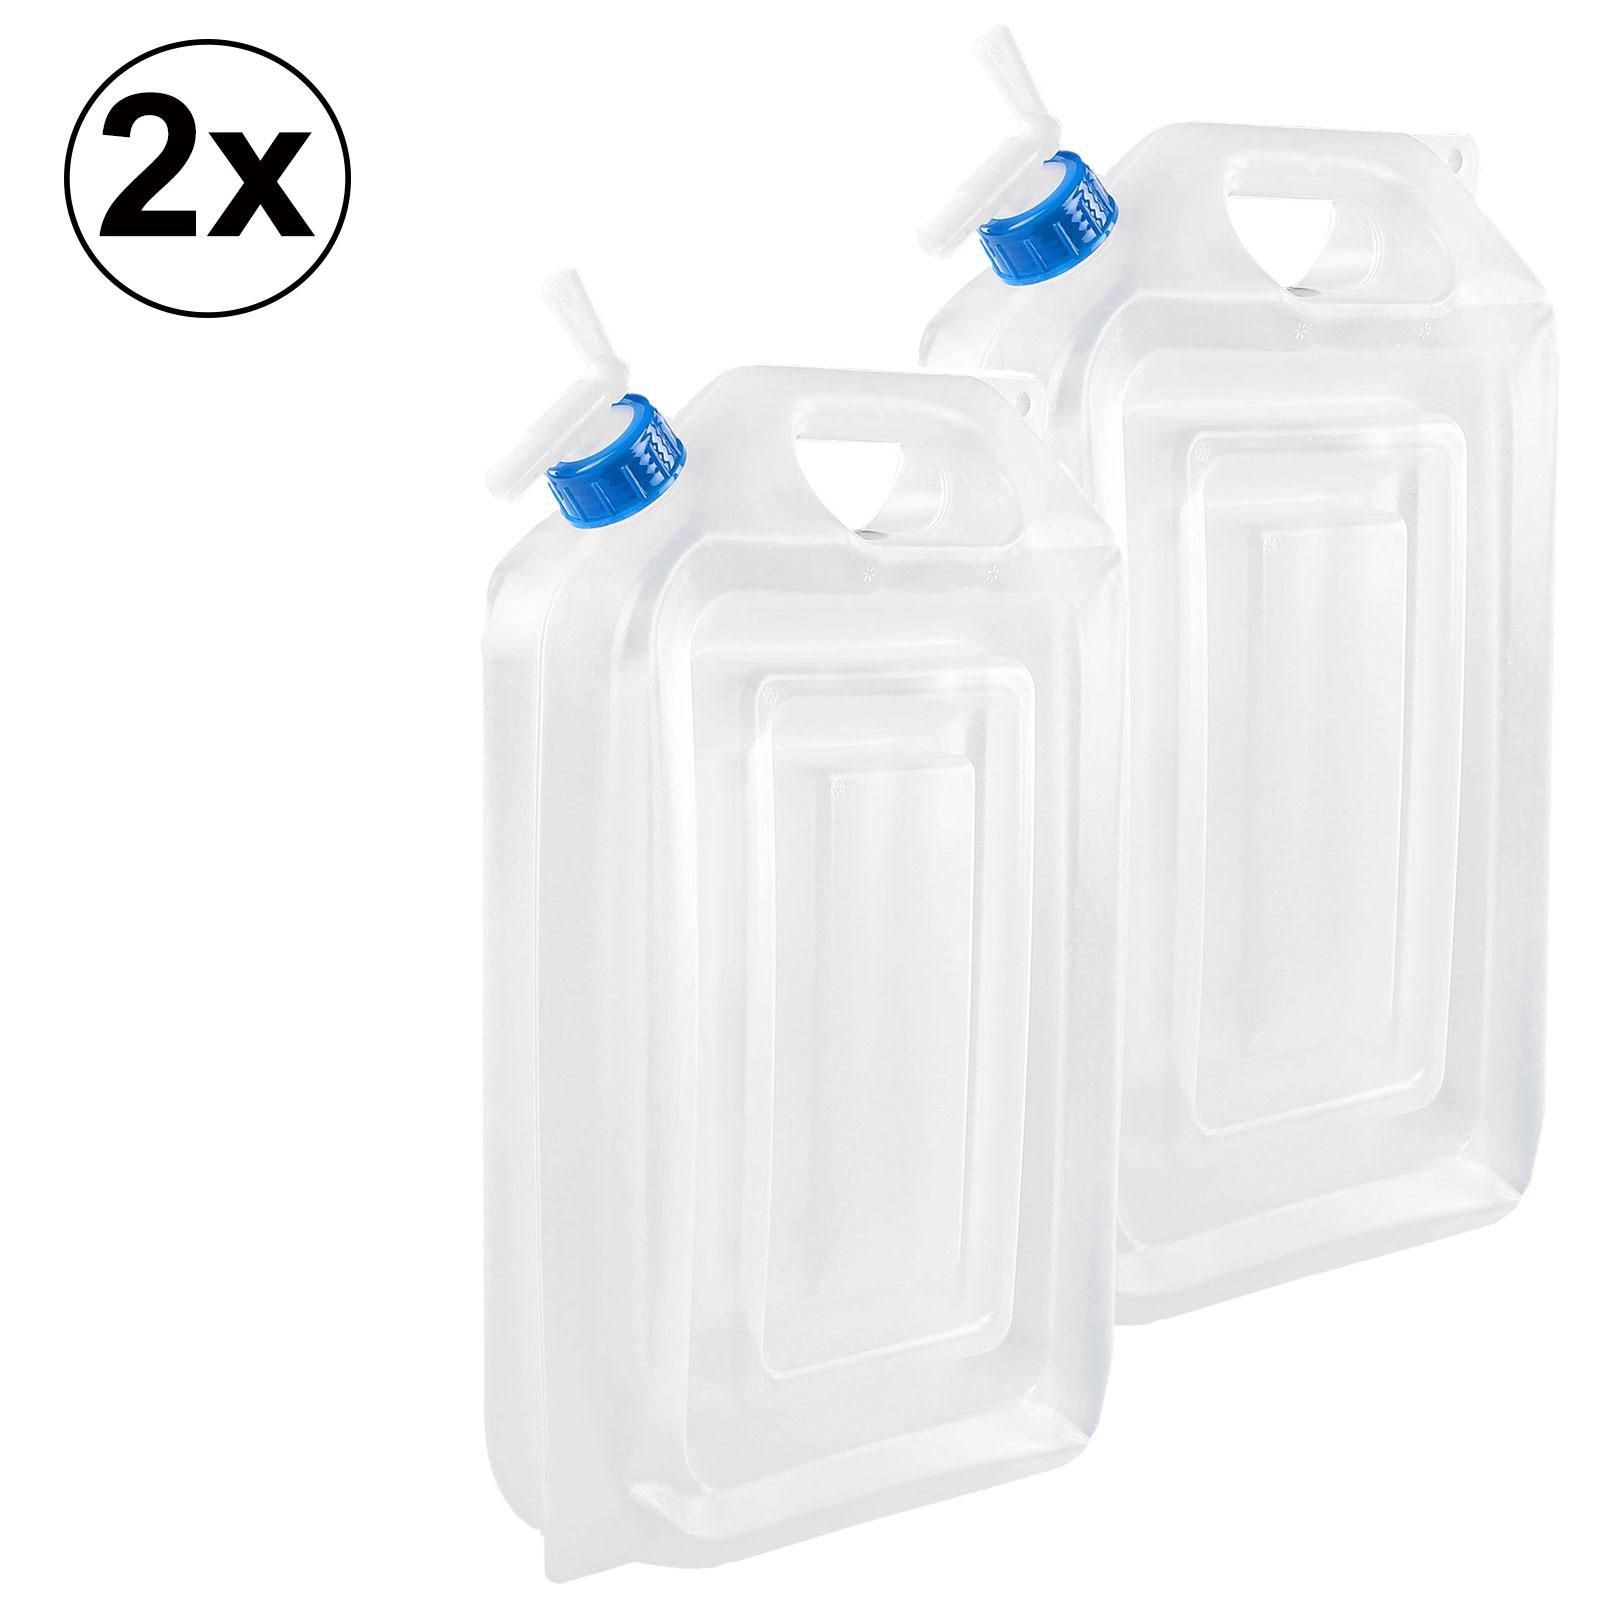 Kanister 16 Liter extra platzsparend 2er Set